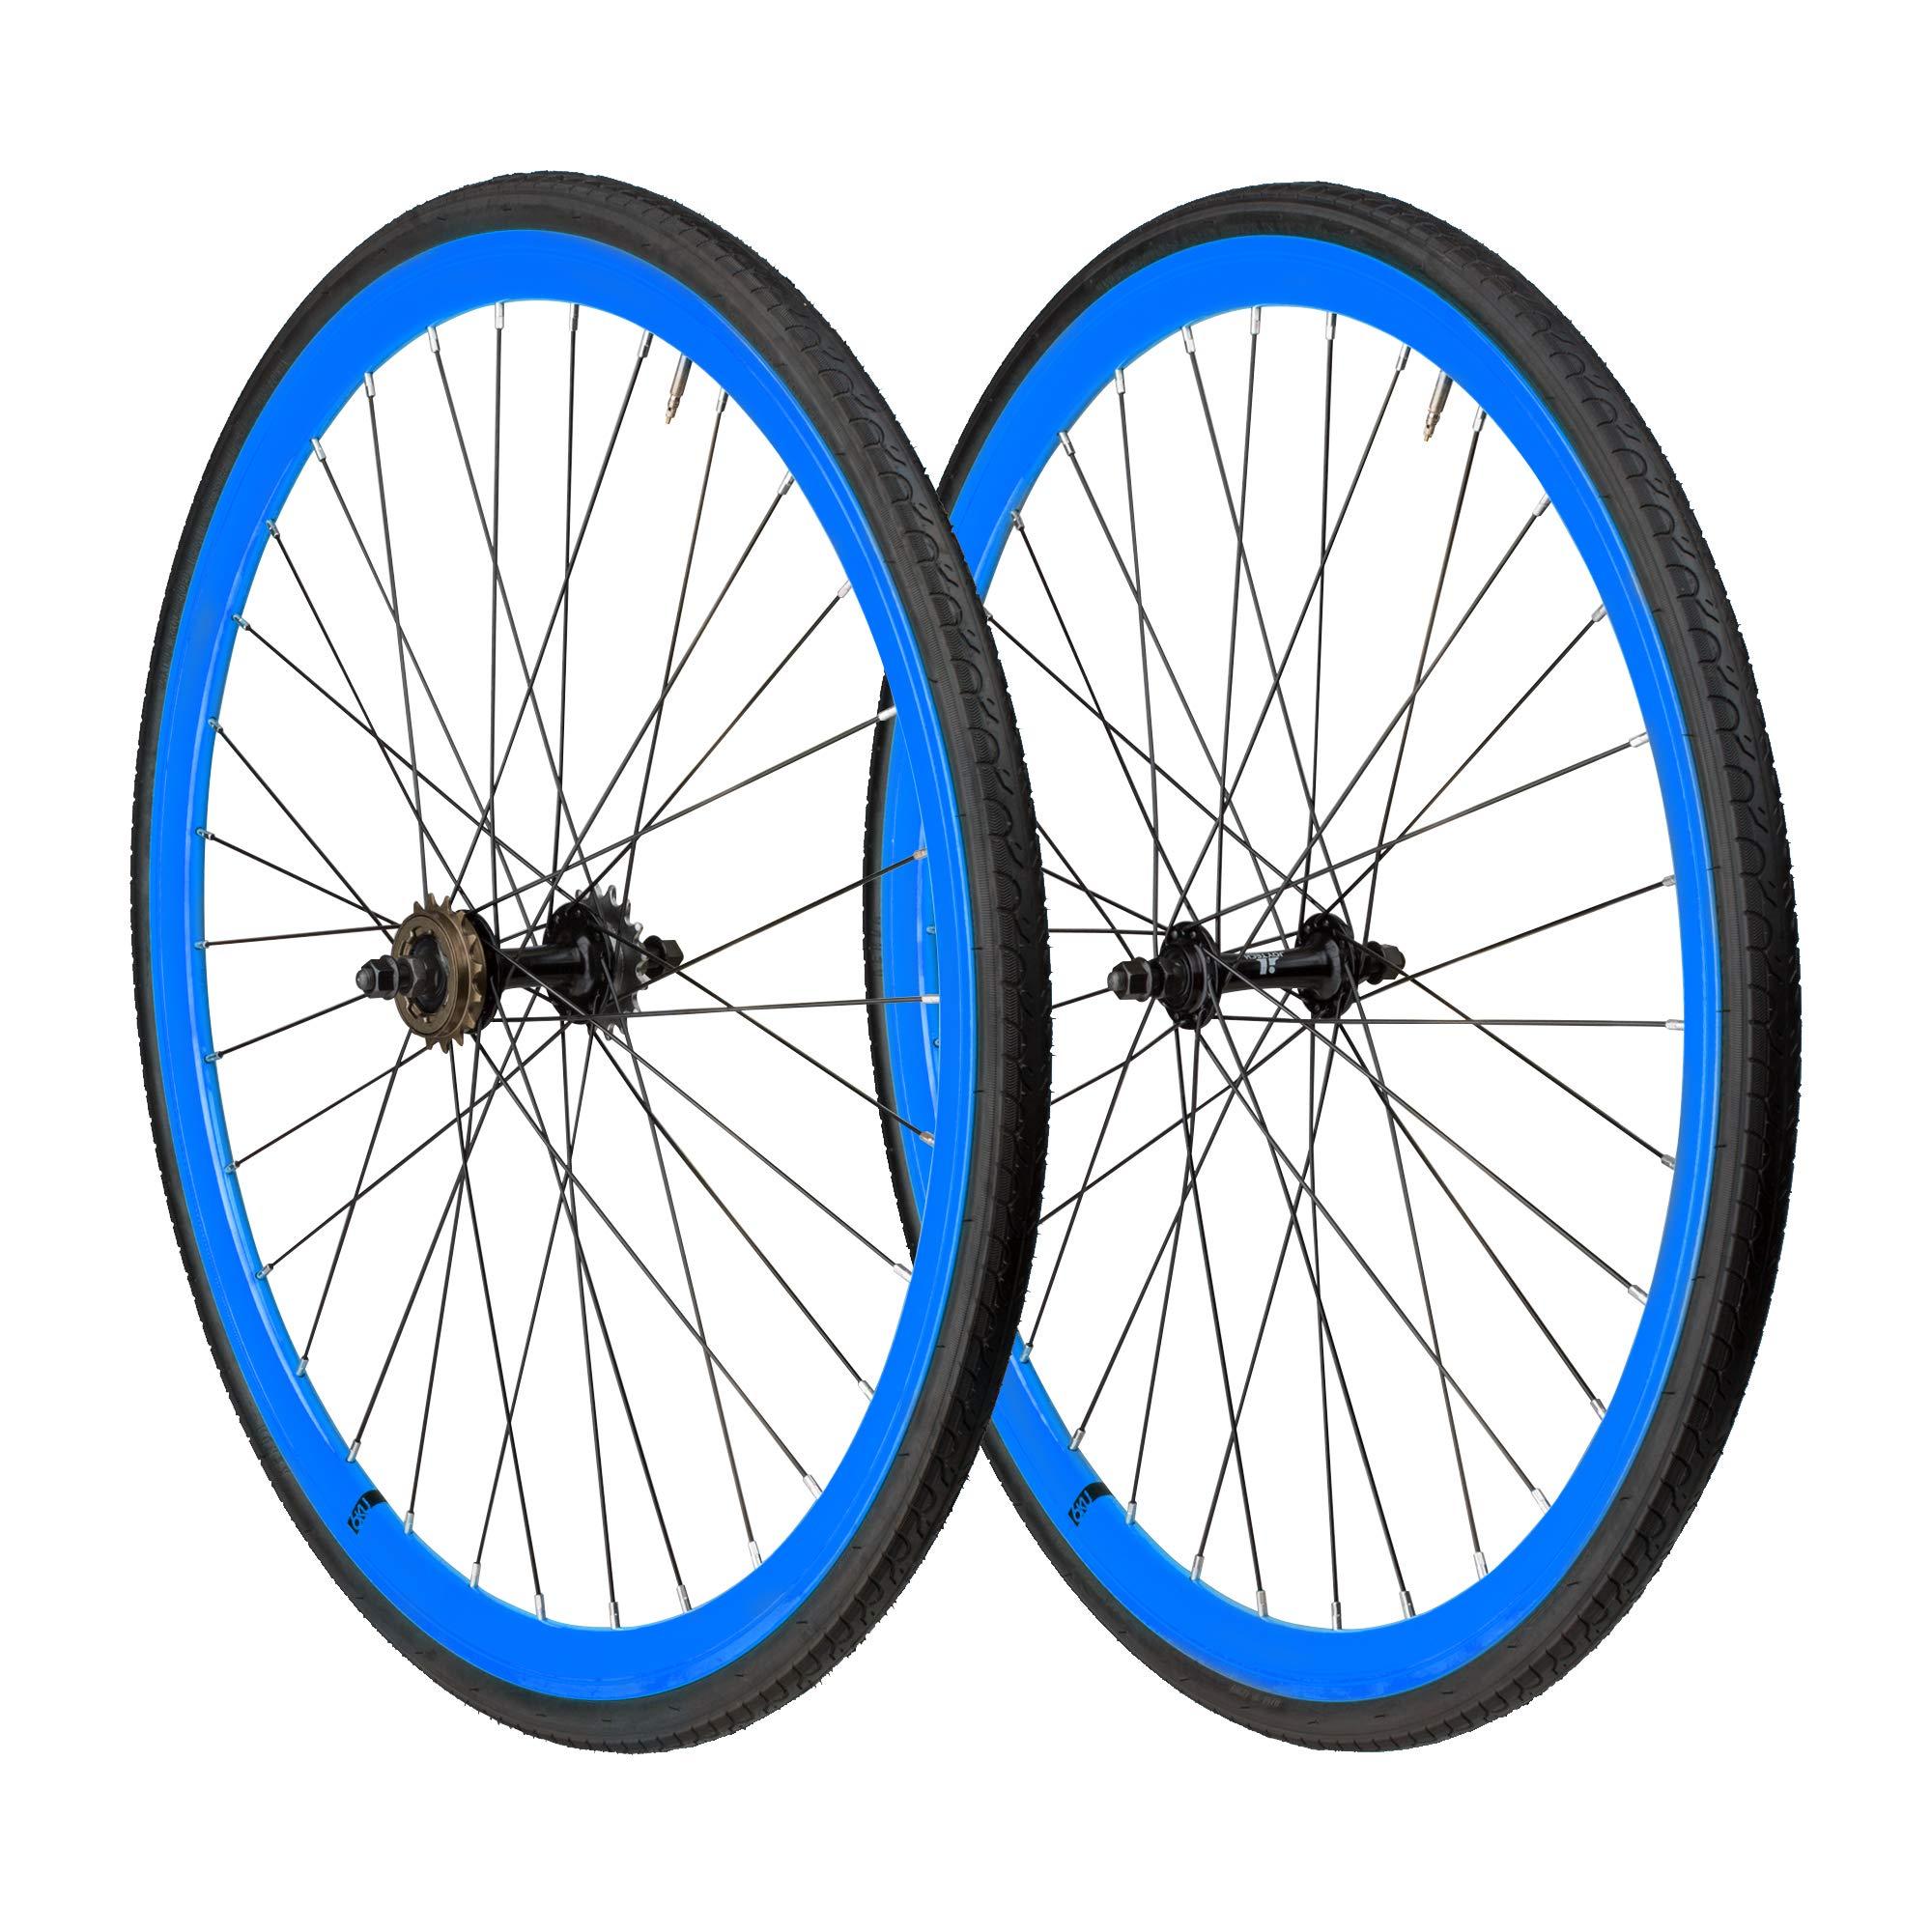 6KU 700C Deep V Alloy Fixie Wheelset, Gloss Blue